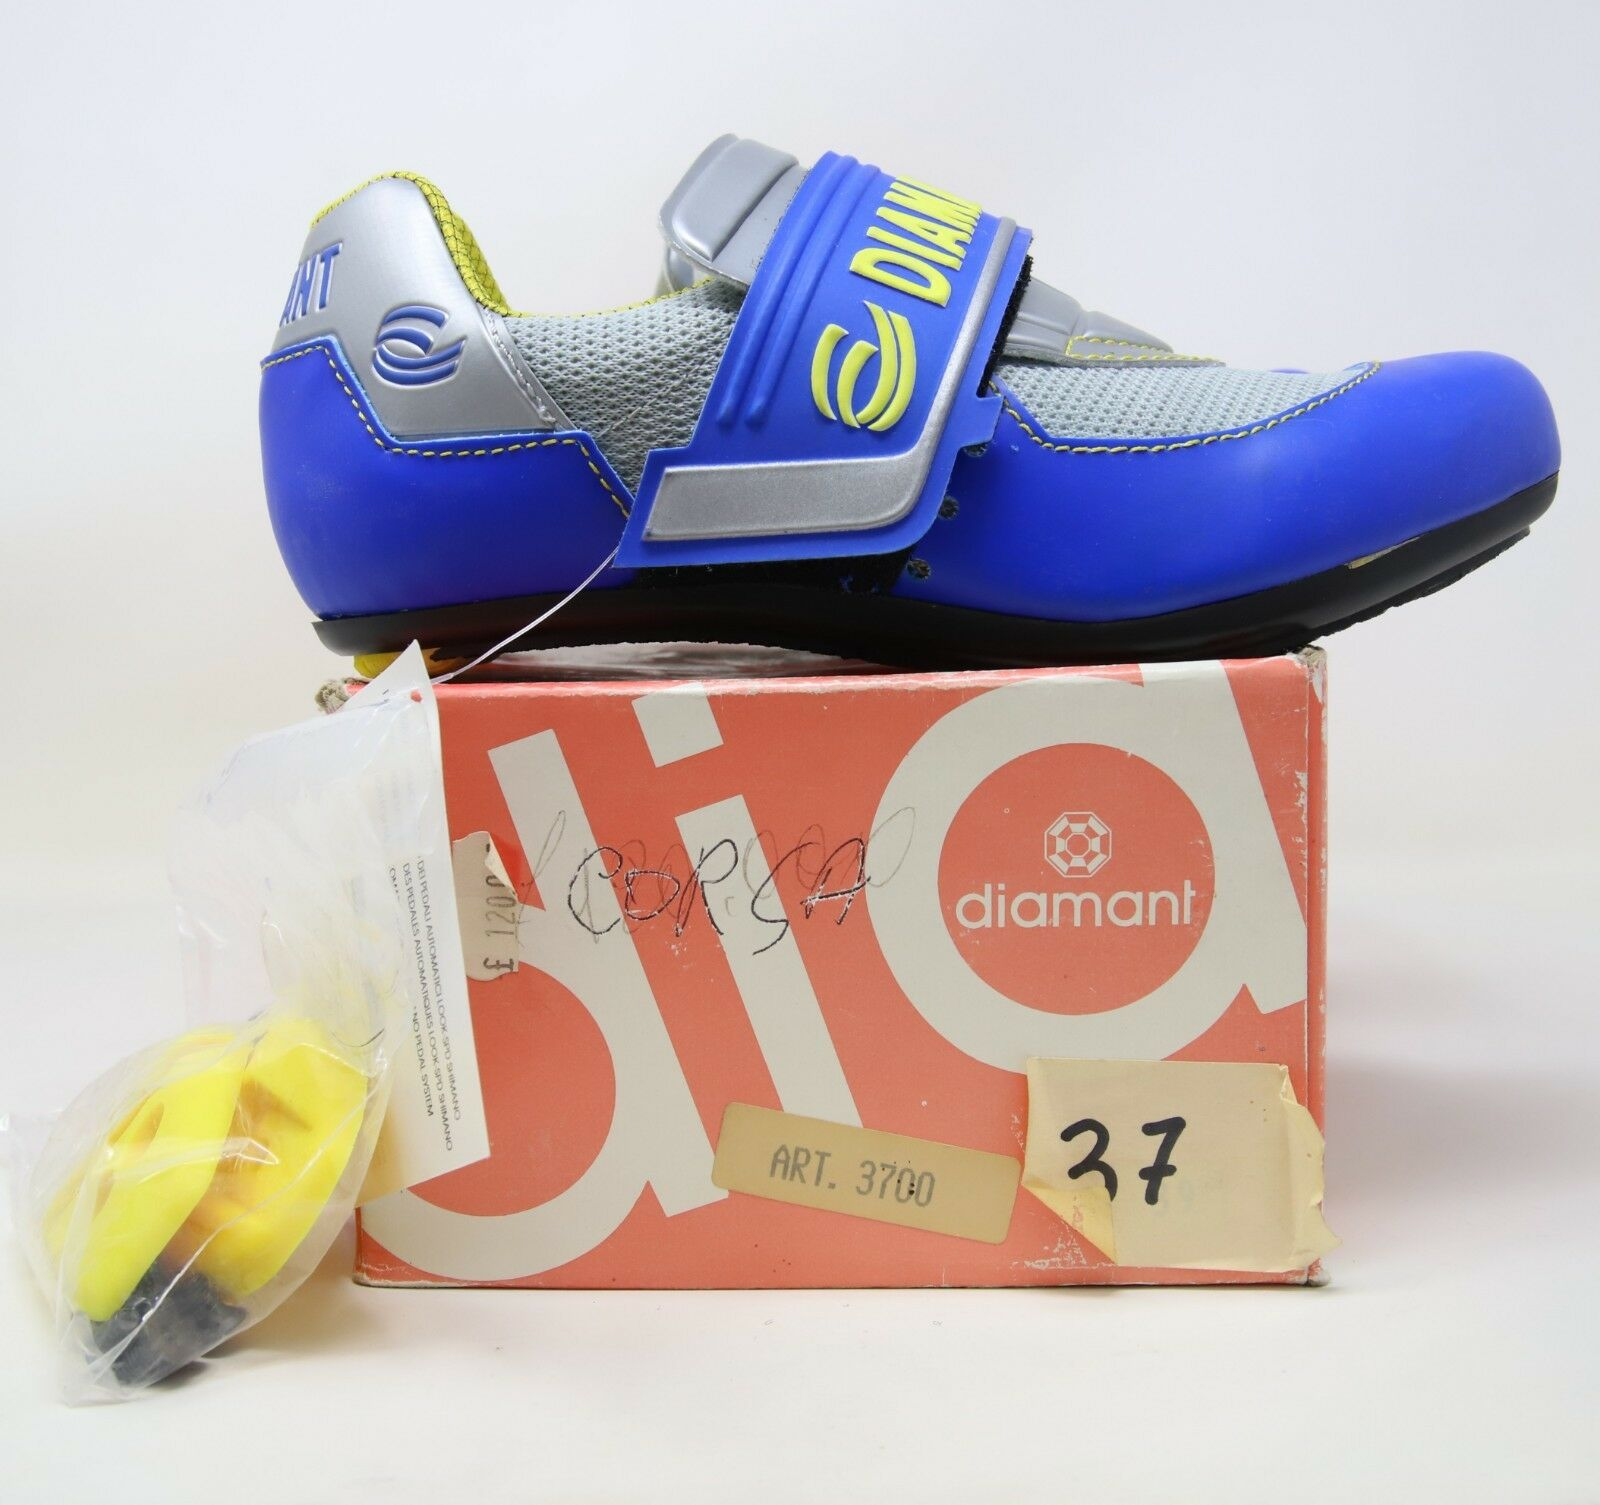 DIAMANT CYCLING RACING SHOES SIZE VINTAGE 90s - NOS NIB